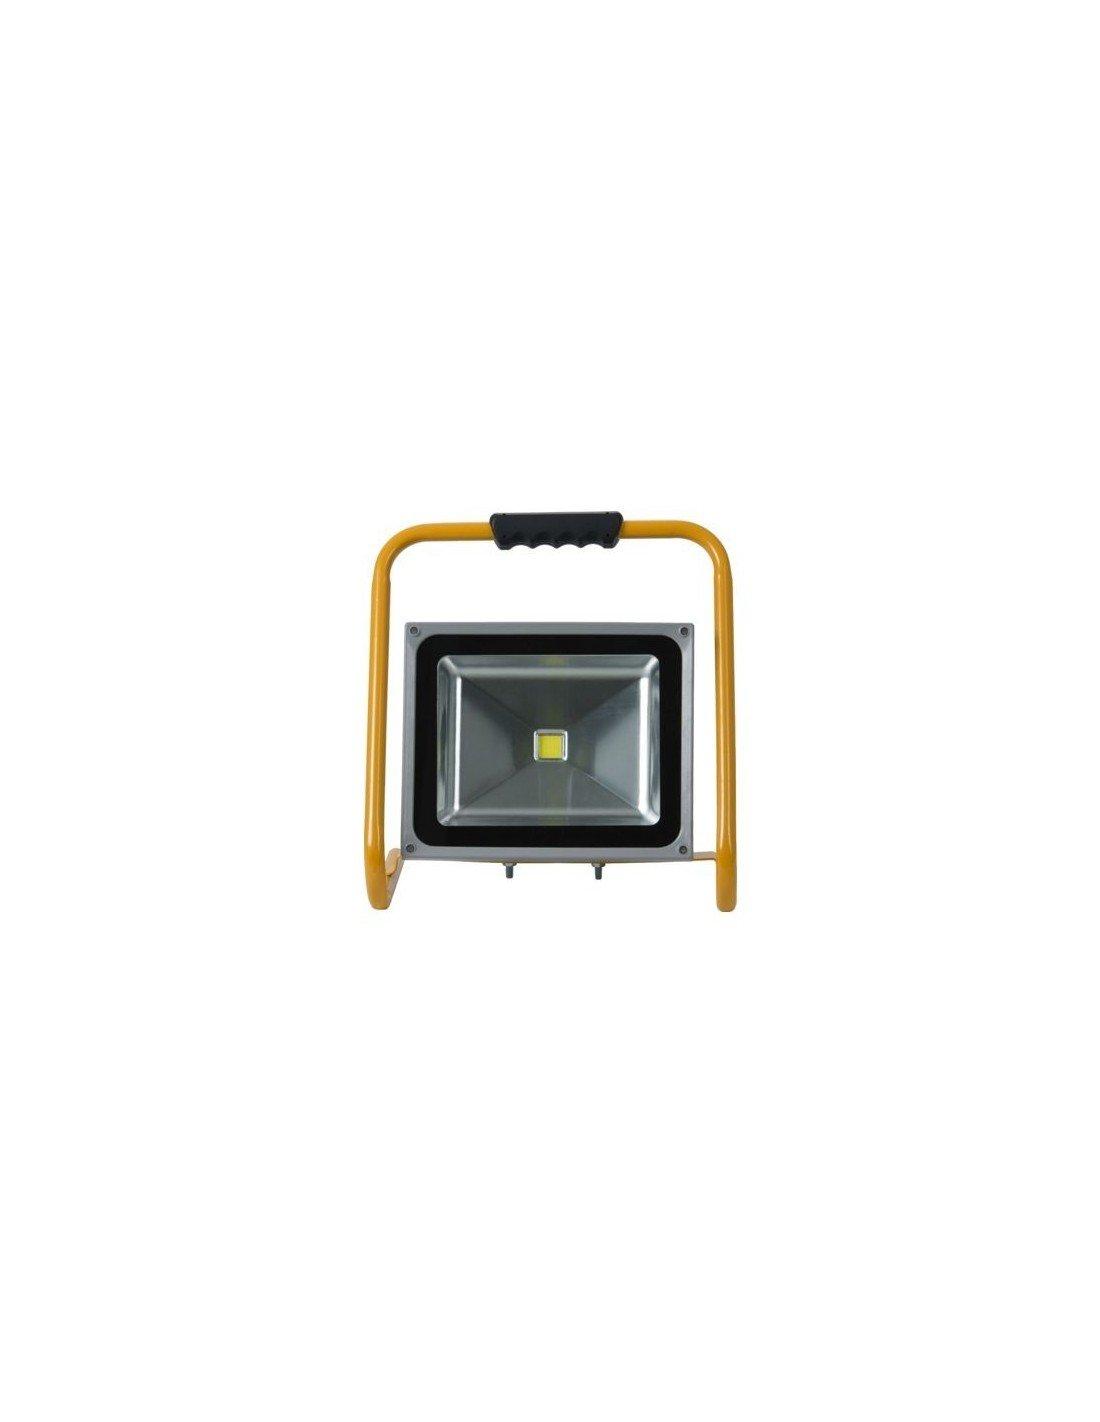 Proyector de obra portátil a LED 50 W cable ho7rnf 5 ml: Amazon.es ...